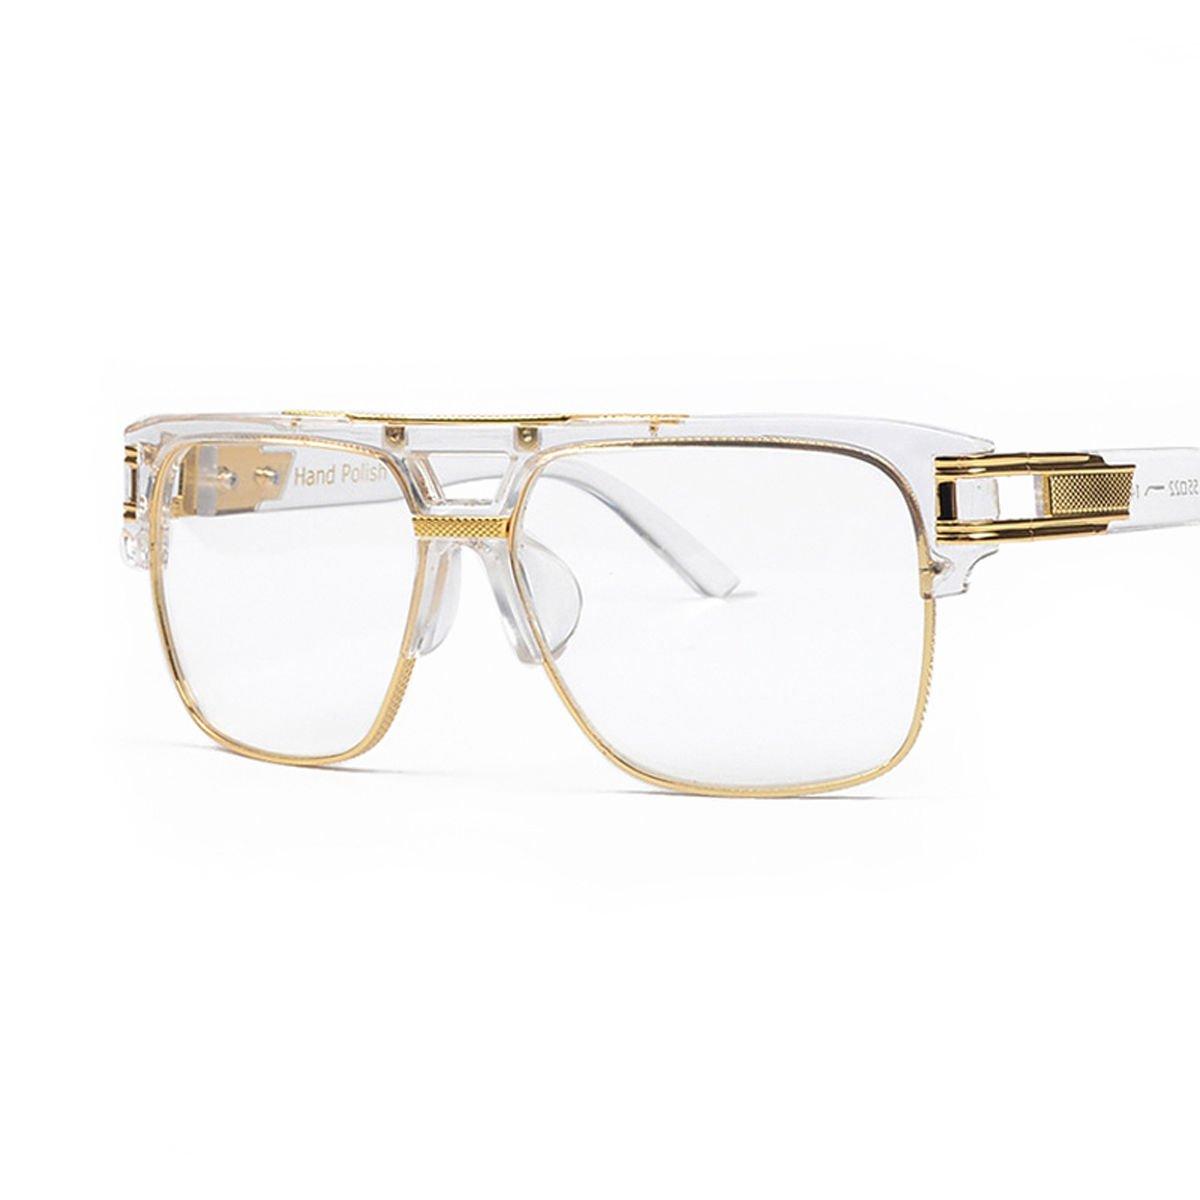 Men's Gold Clear Lens Hip Hop Paid In Full Large Frame Glasses